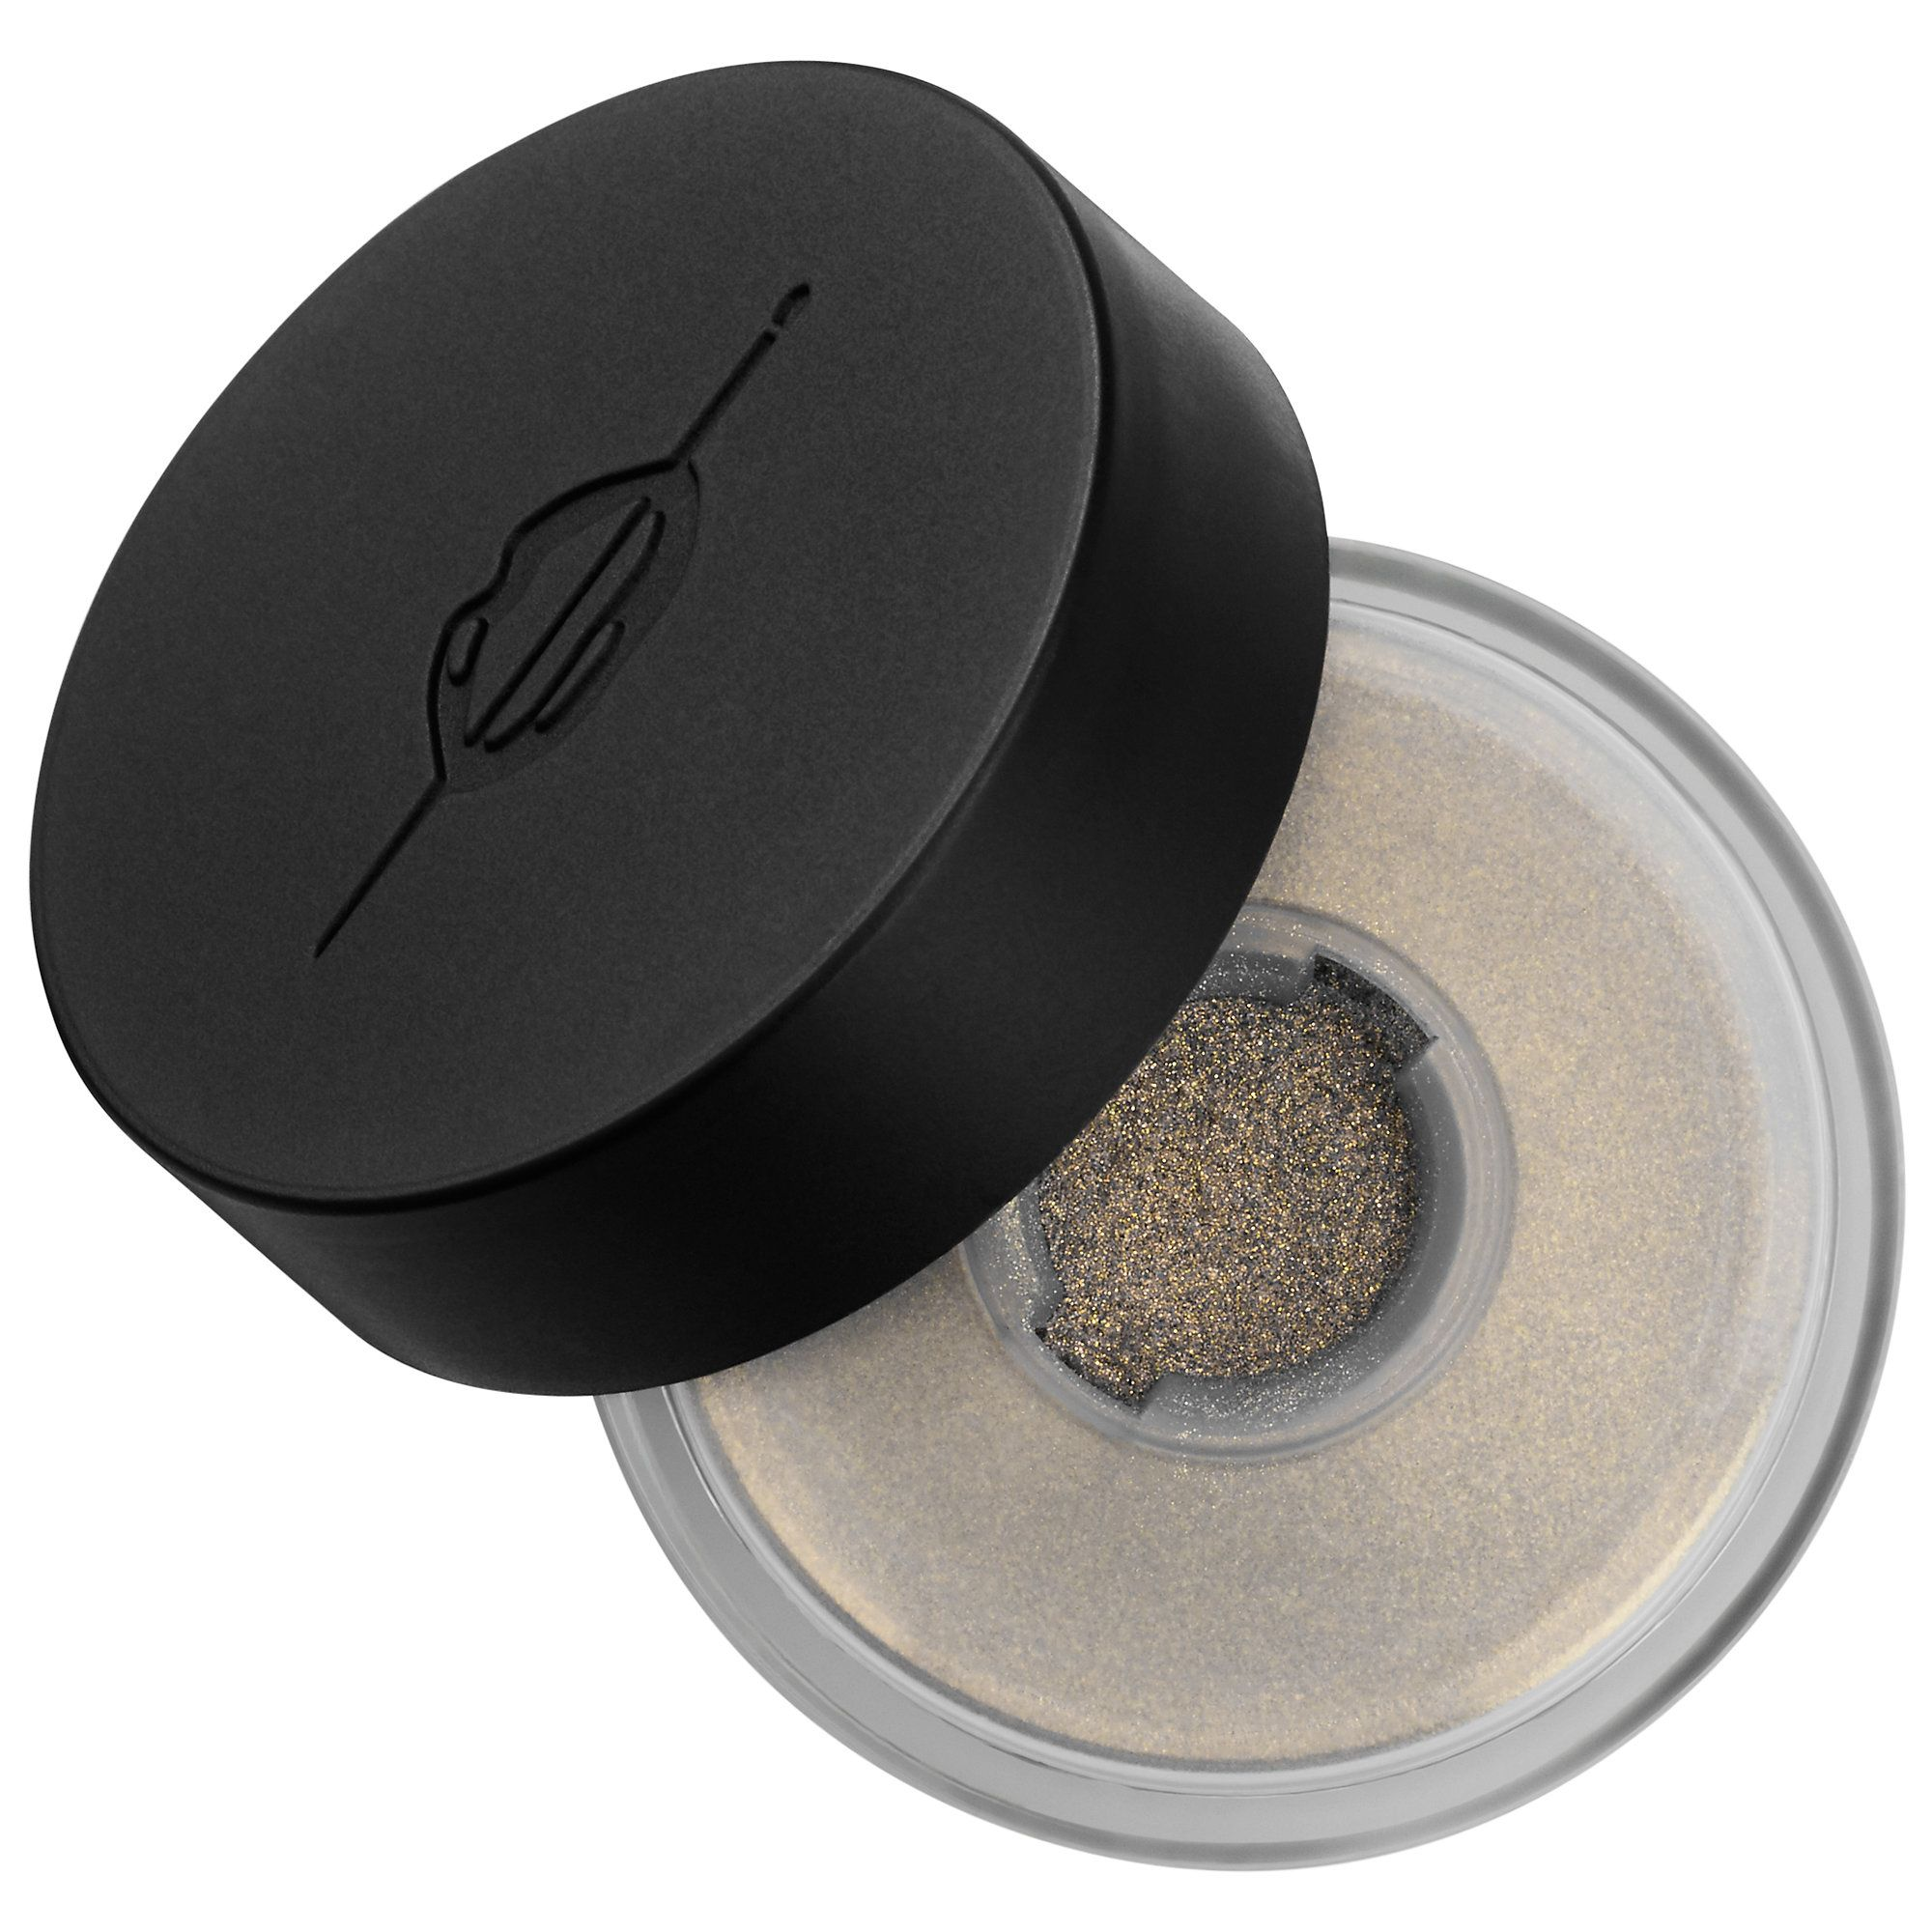 Star Lit Powder Makeup, Eye pigments, Make up for ever